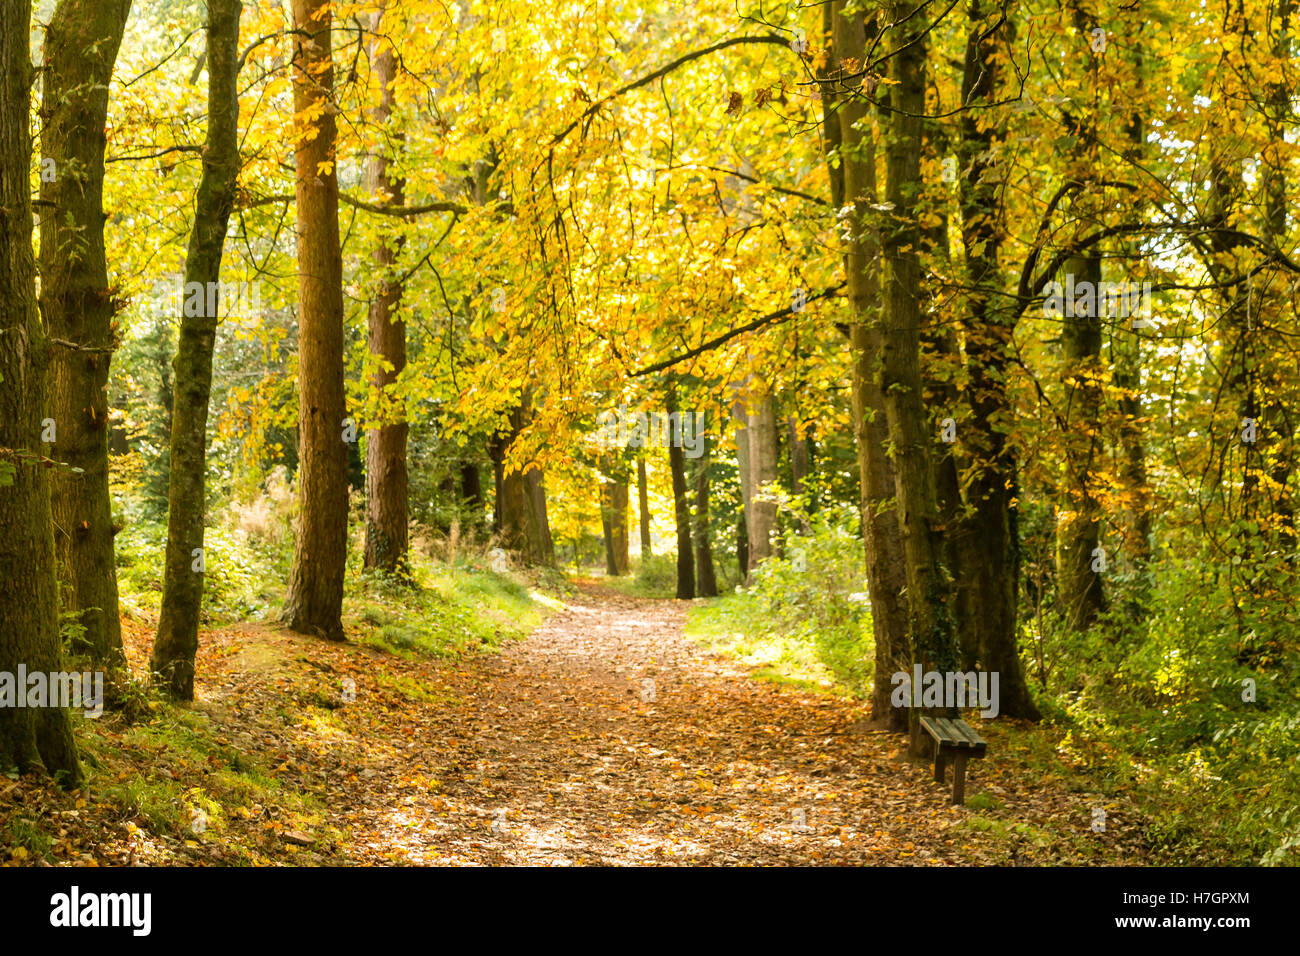 Autumn colours and trees,  woodland walk, Cyfarthfa Park, Merthyr Tydfil, South Wales - Stock Image